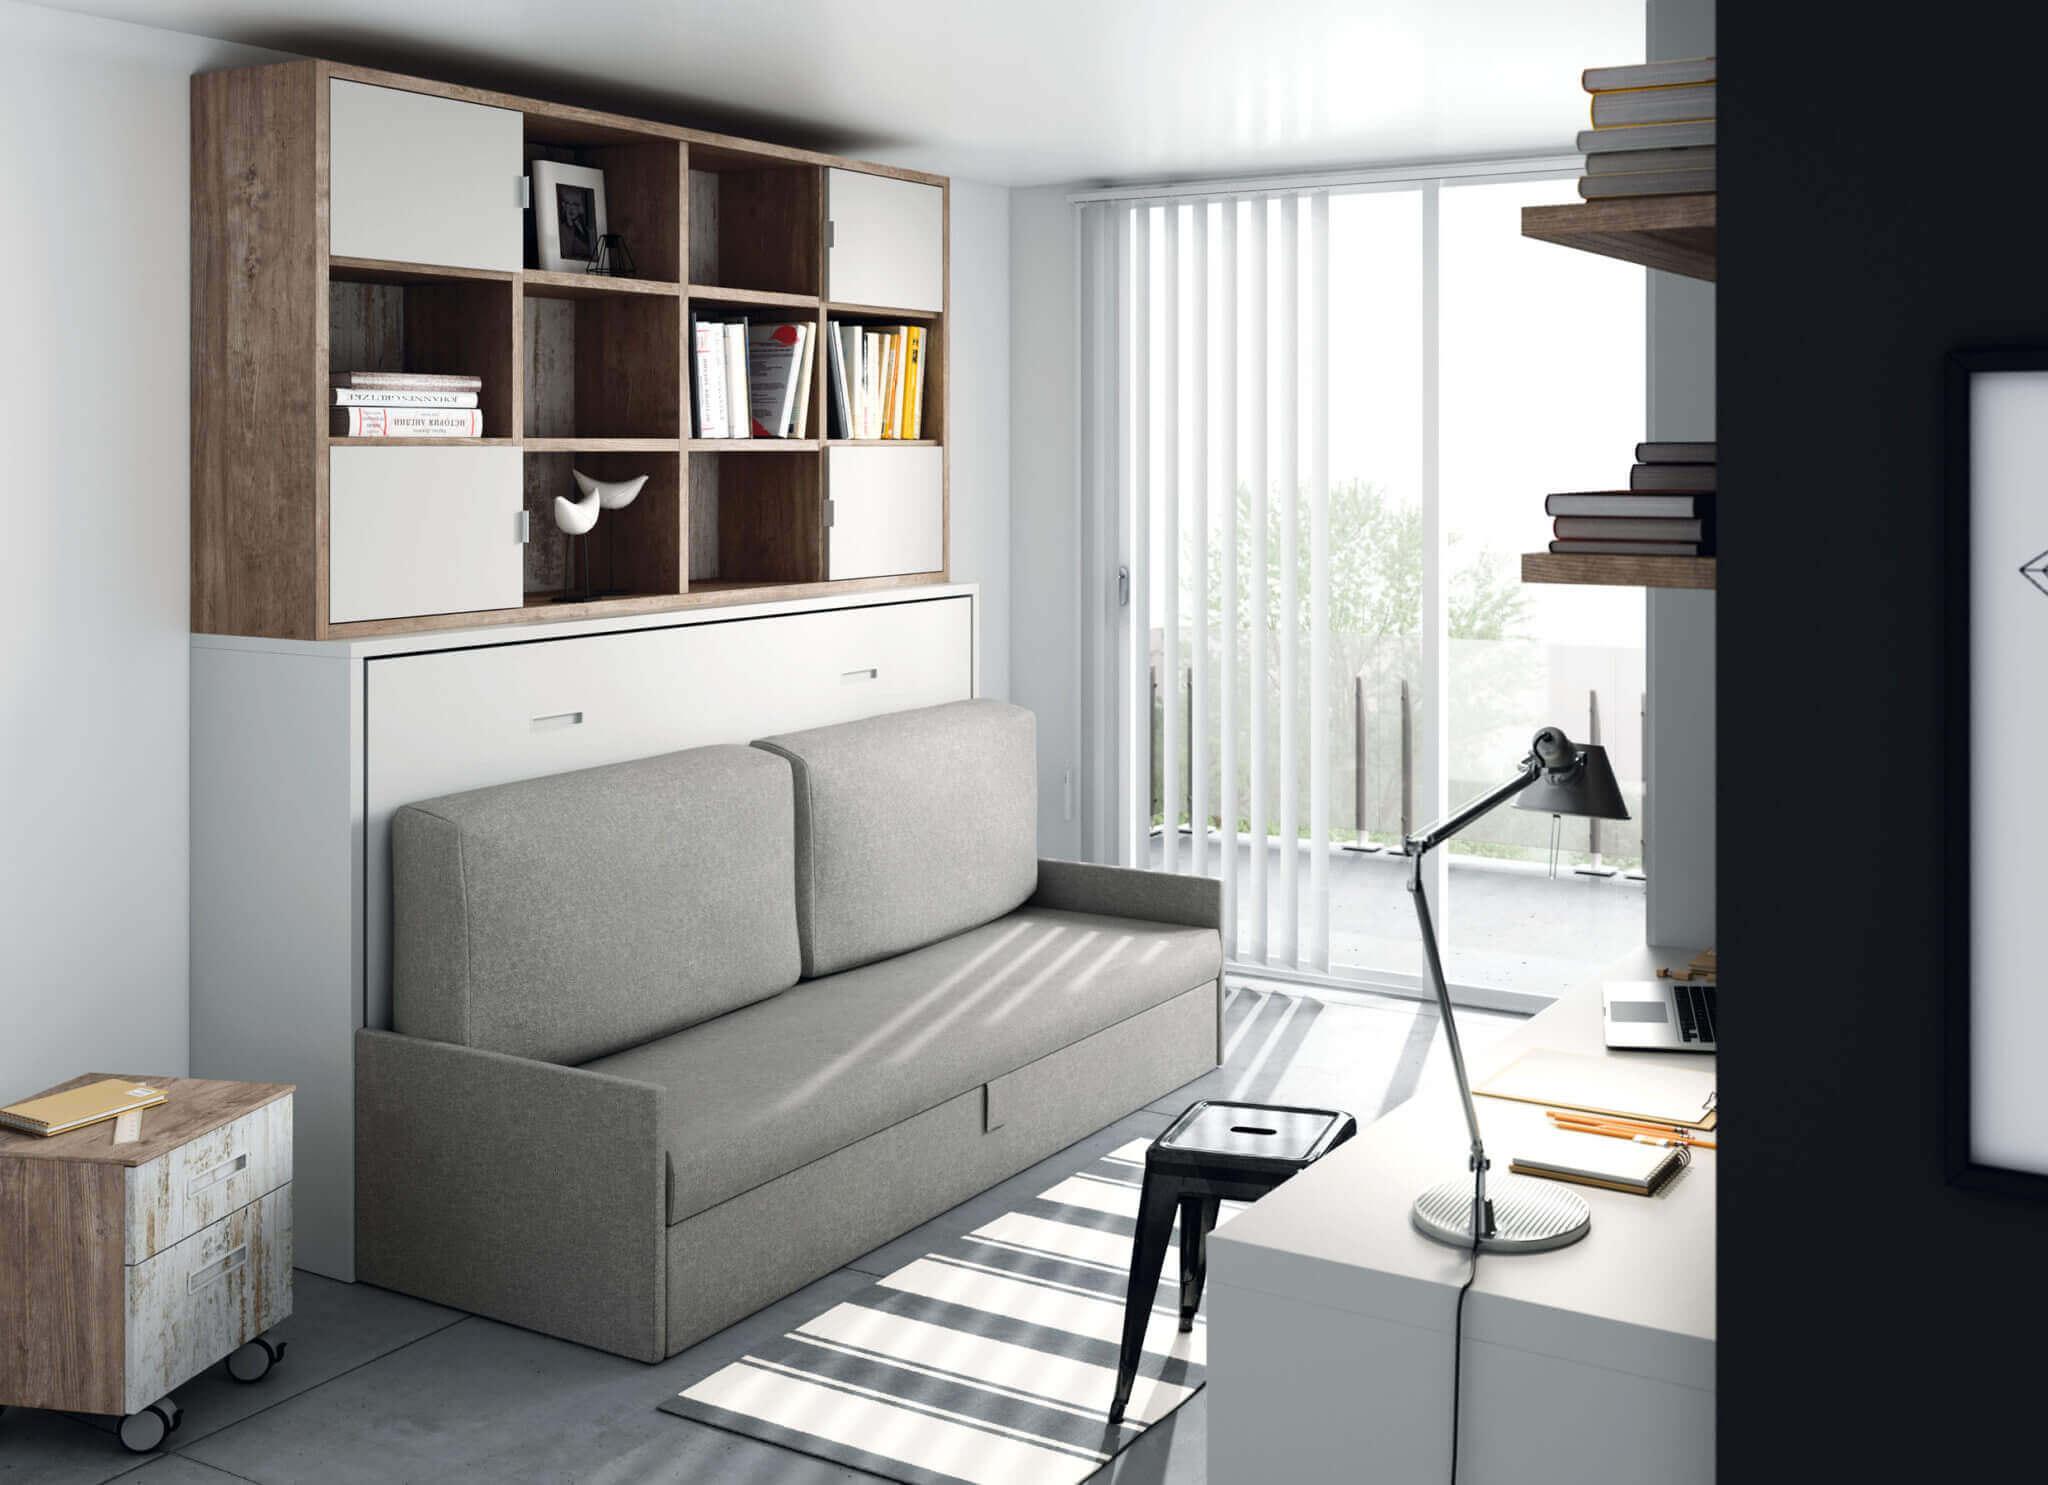 Camas abatibles horizontales con sofa camas abatibles - Camas muebles abatibles ...